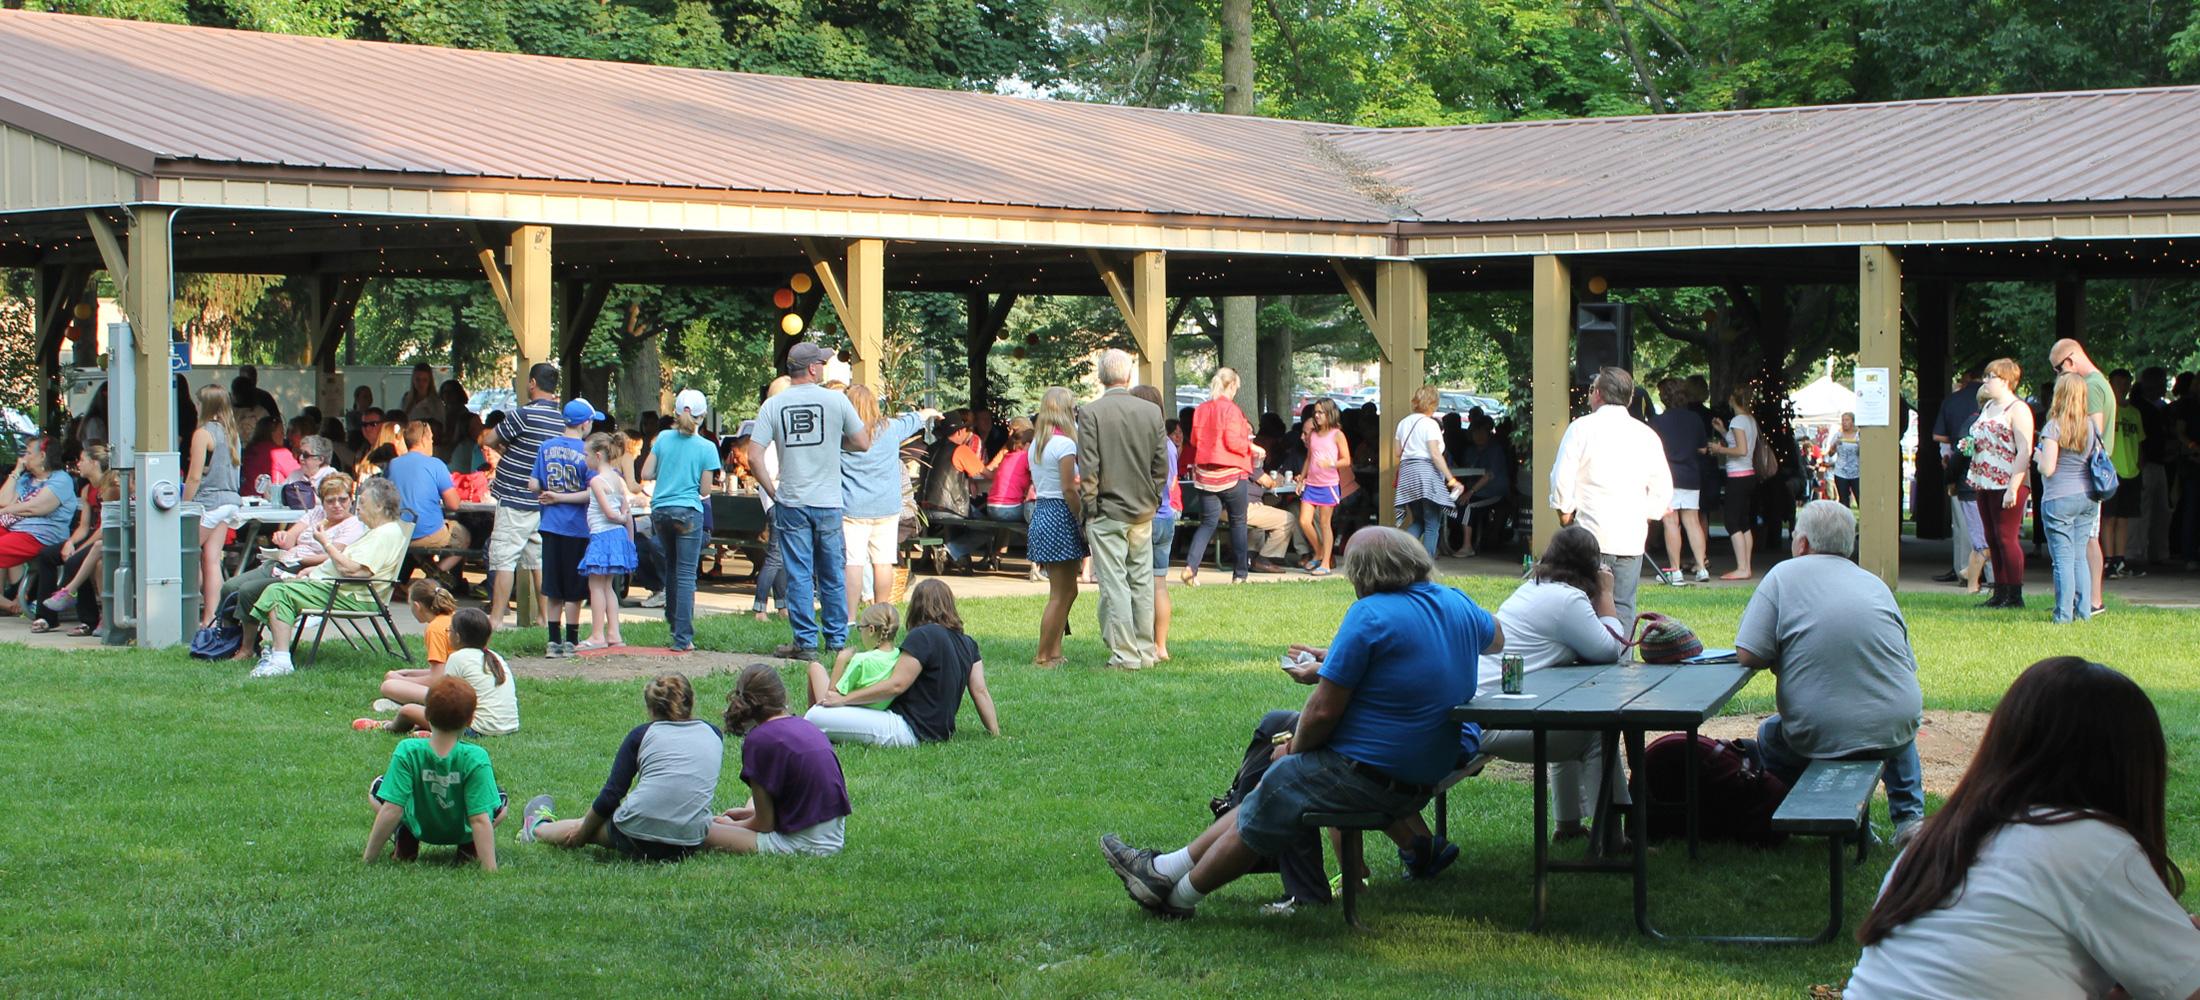 germantown-community-gathering